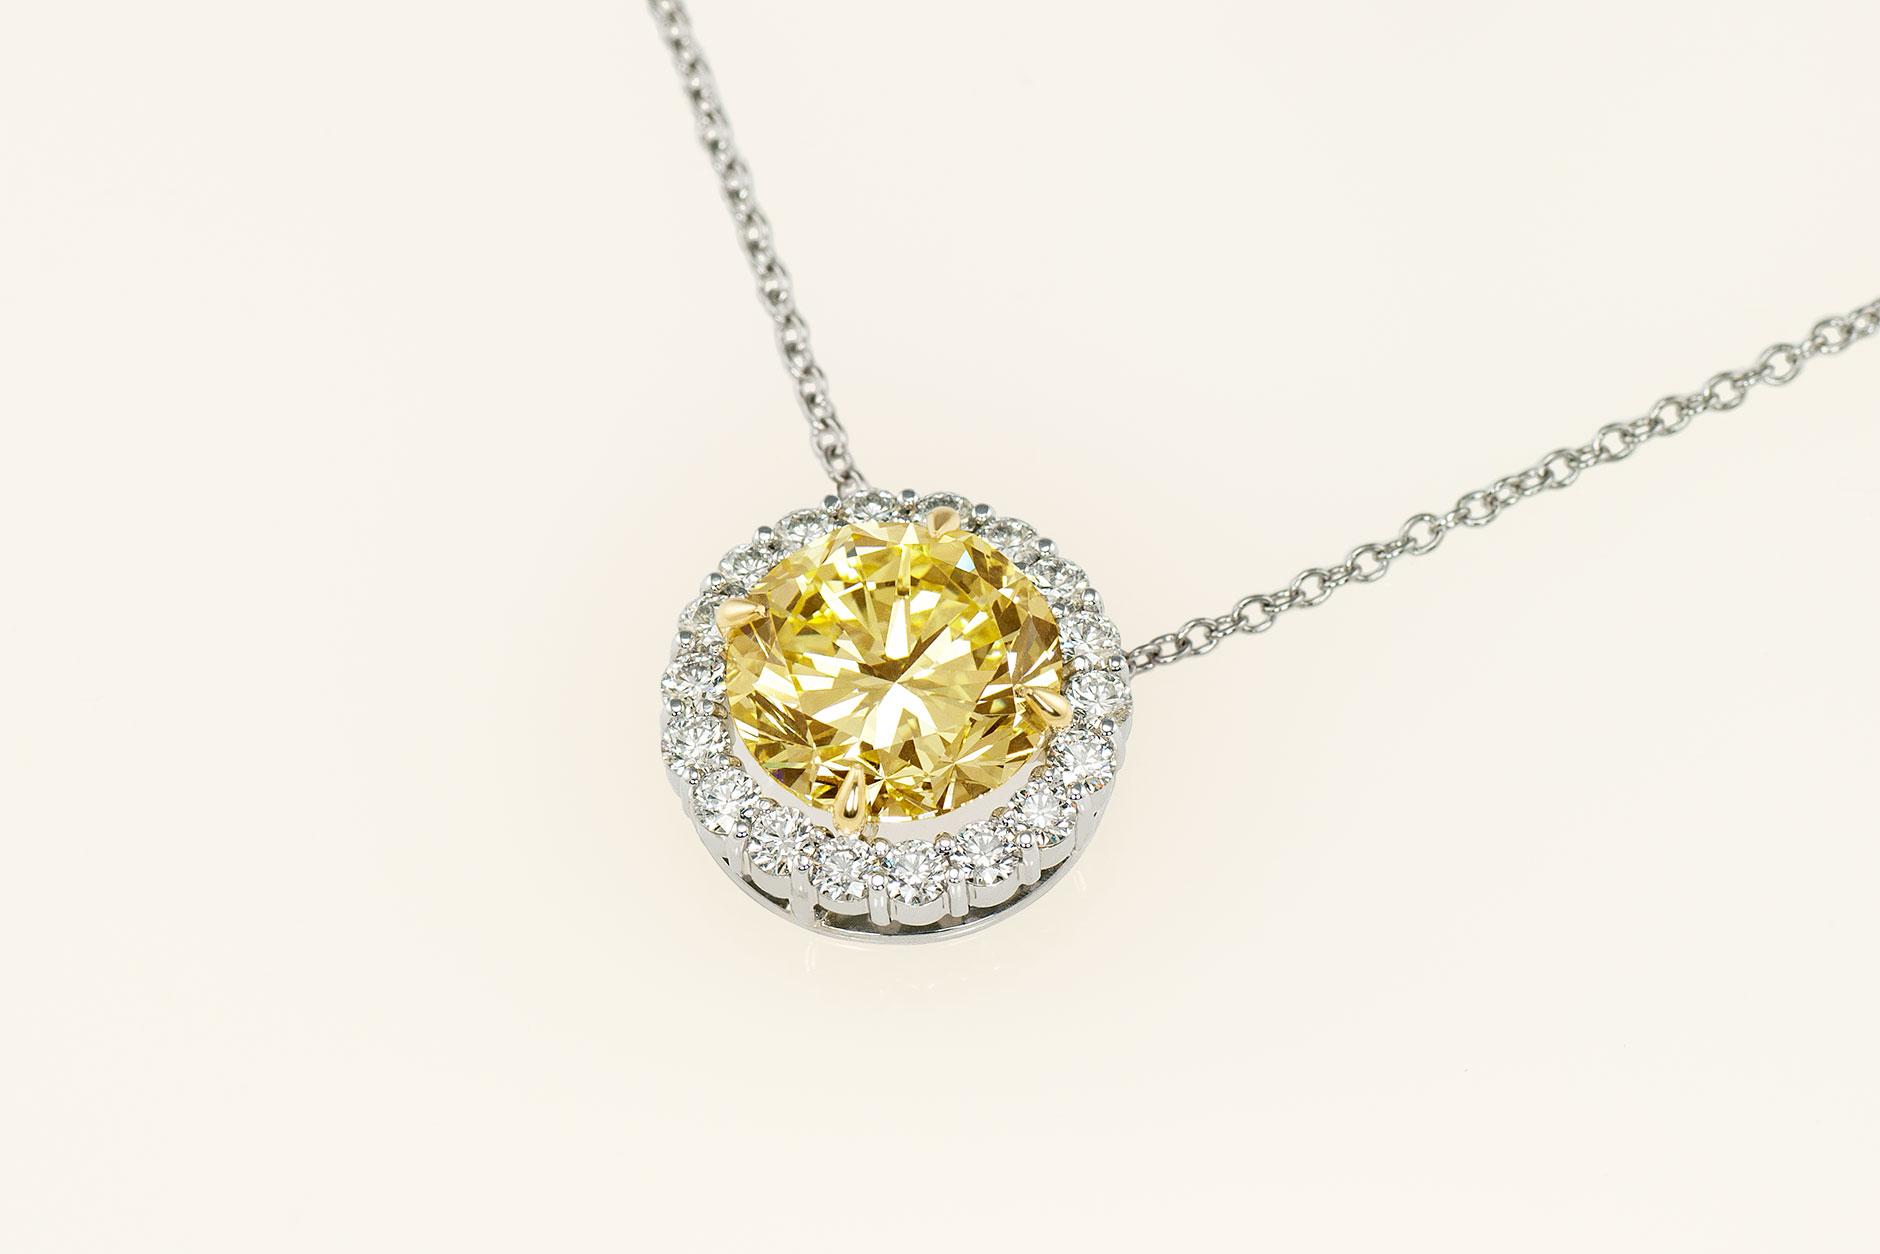 Custom Platinum & 18k 8.9 ct Fancy Yellow Diamond Halo Pendant - NEWA Goldsmith